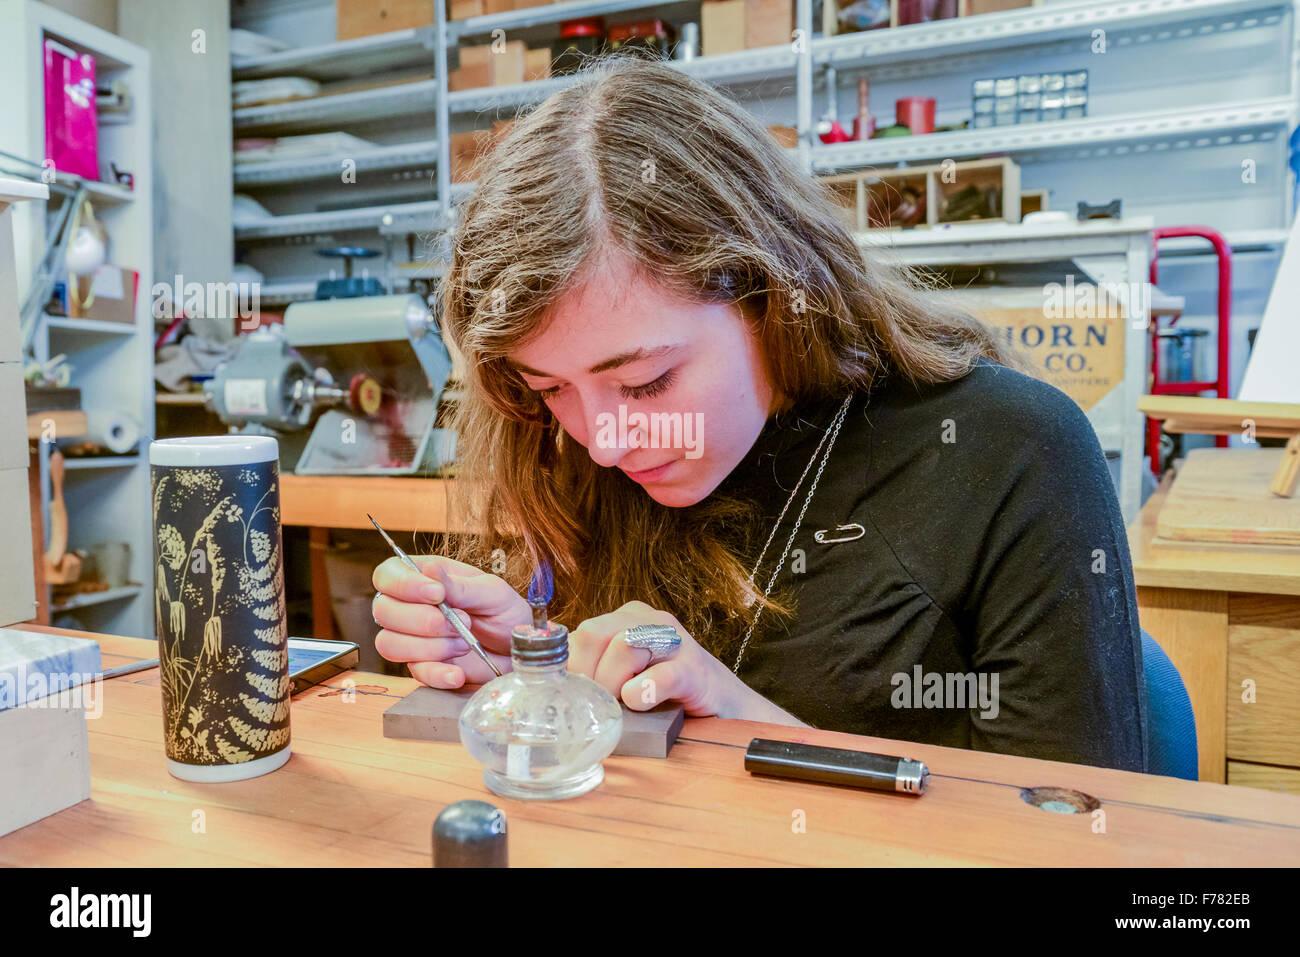 Juwelier, Parker, die Straße Studios, 2015, Ostseite Kultur kriechen, Vancouver, Britisch-Kolumbien *, Kanada Stockbild